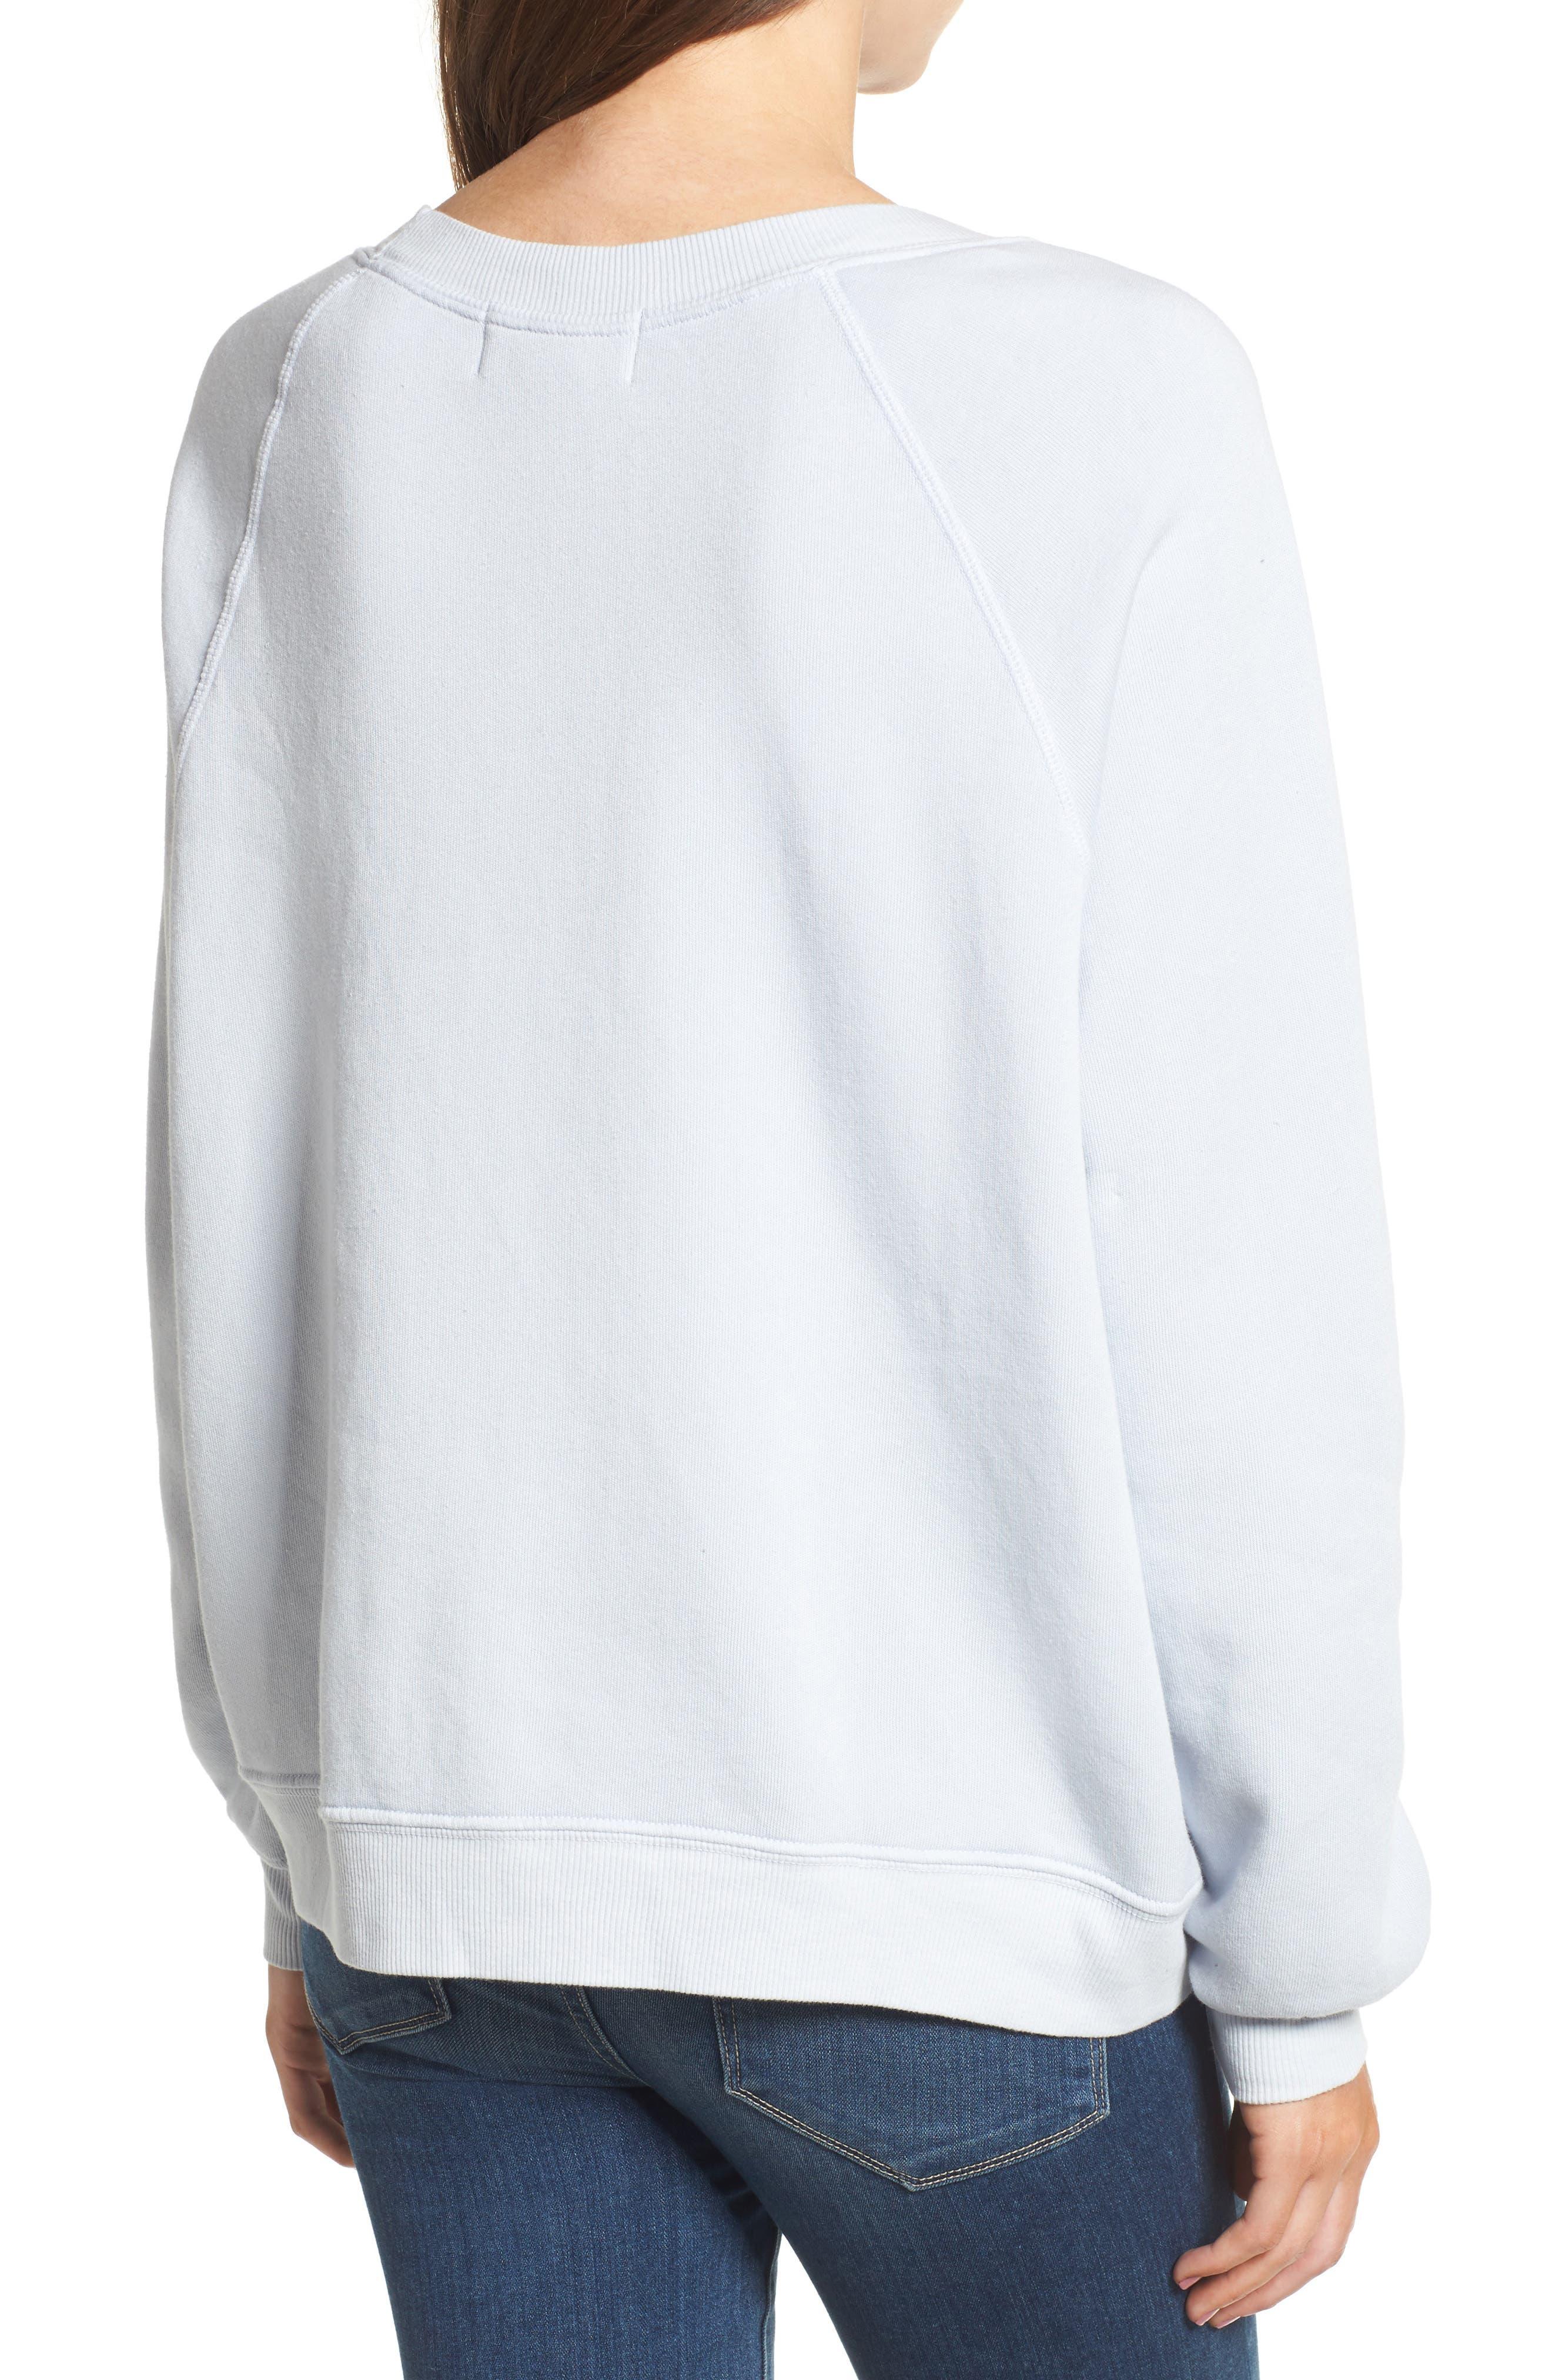 Extreme Snacker Sweatshirt,                             Alternate thumbnail 2, color,                             420